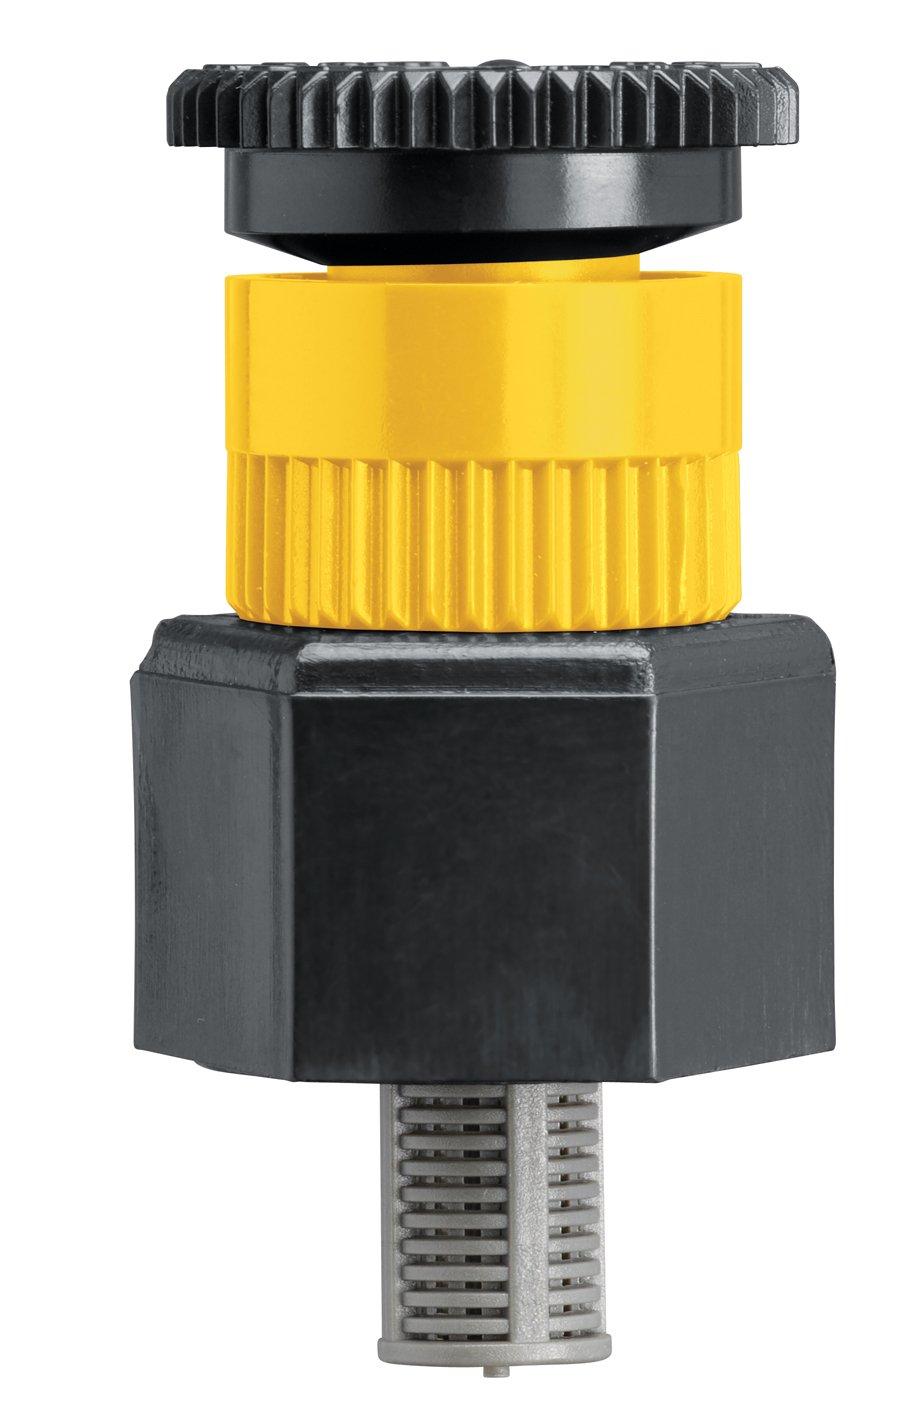 10 Pack - Orbit 4' Radius Adjustable Spray Shrub Sprinkler Head by Orbit